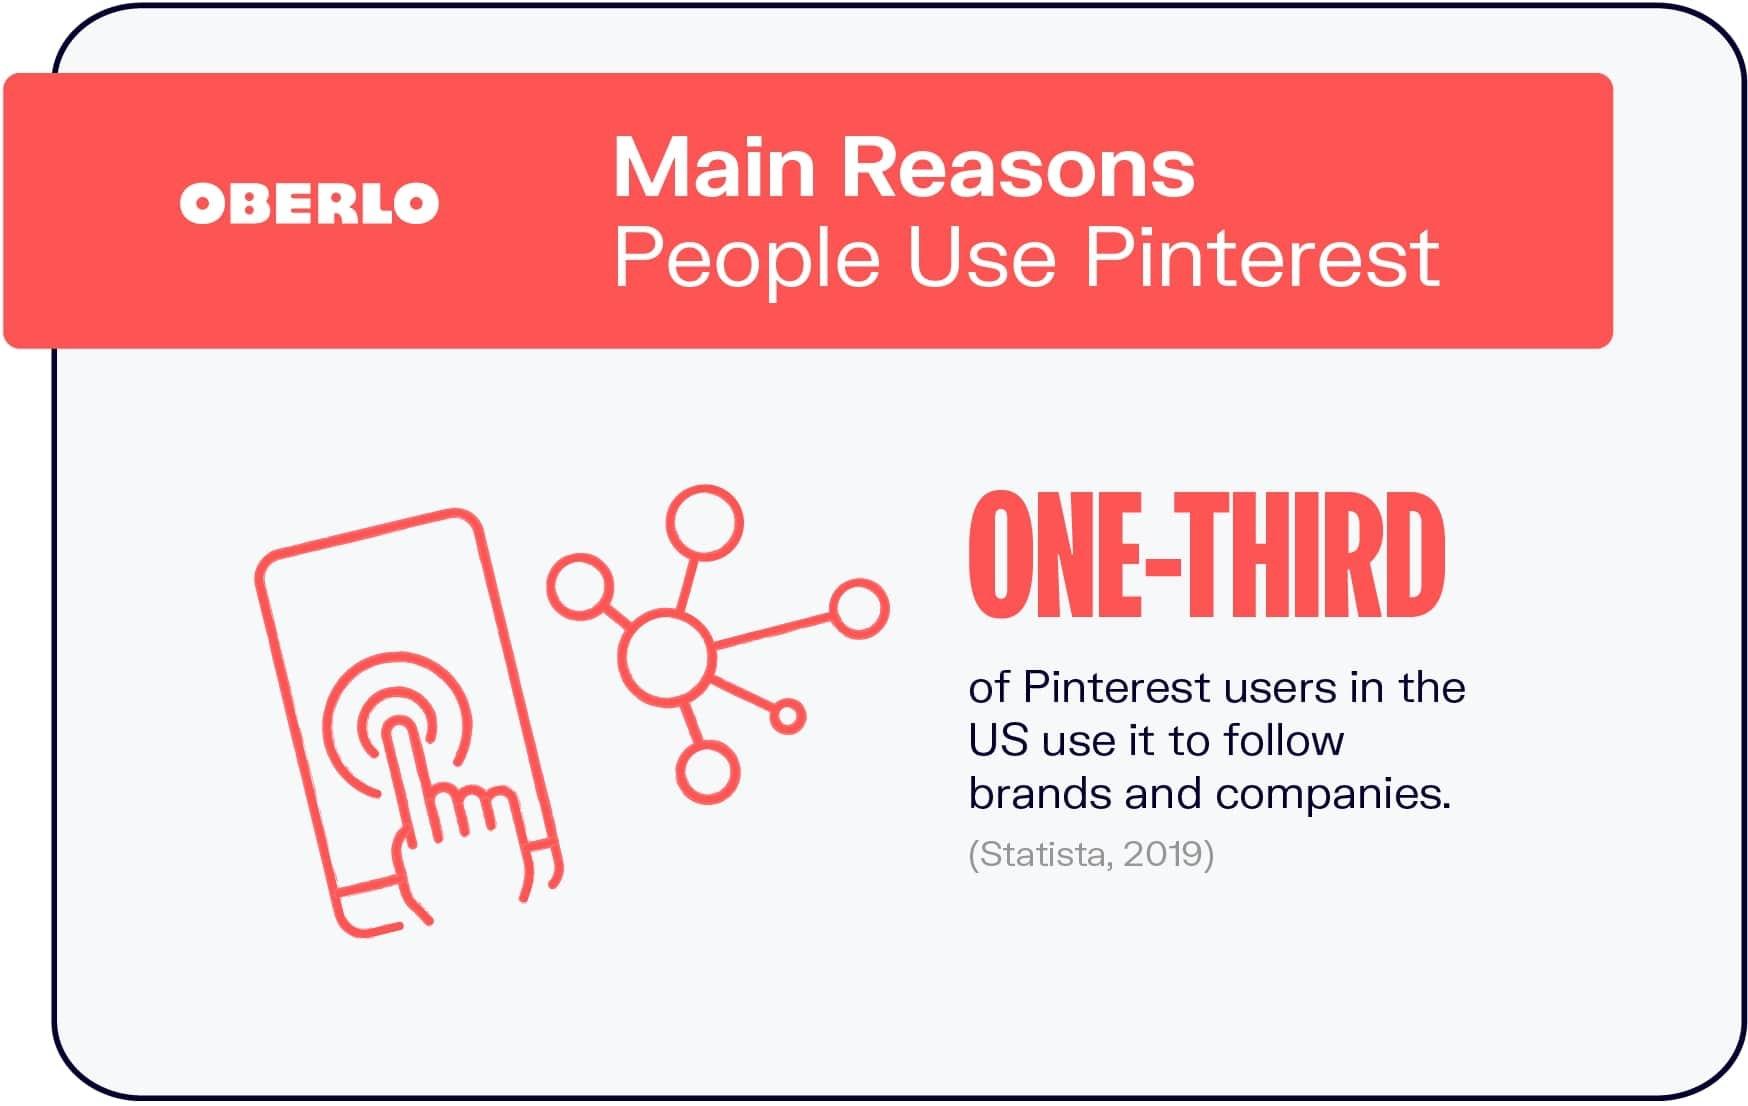 Main Reasons People Use Pinterest